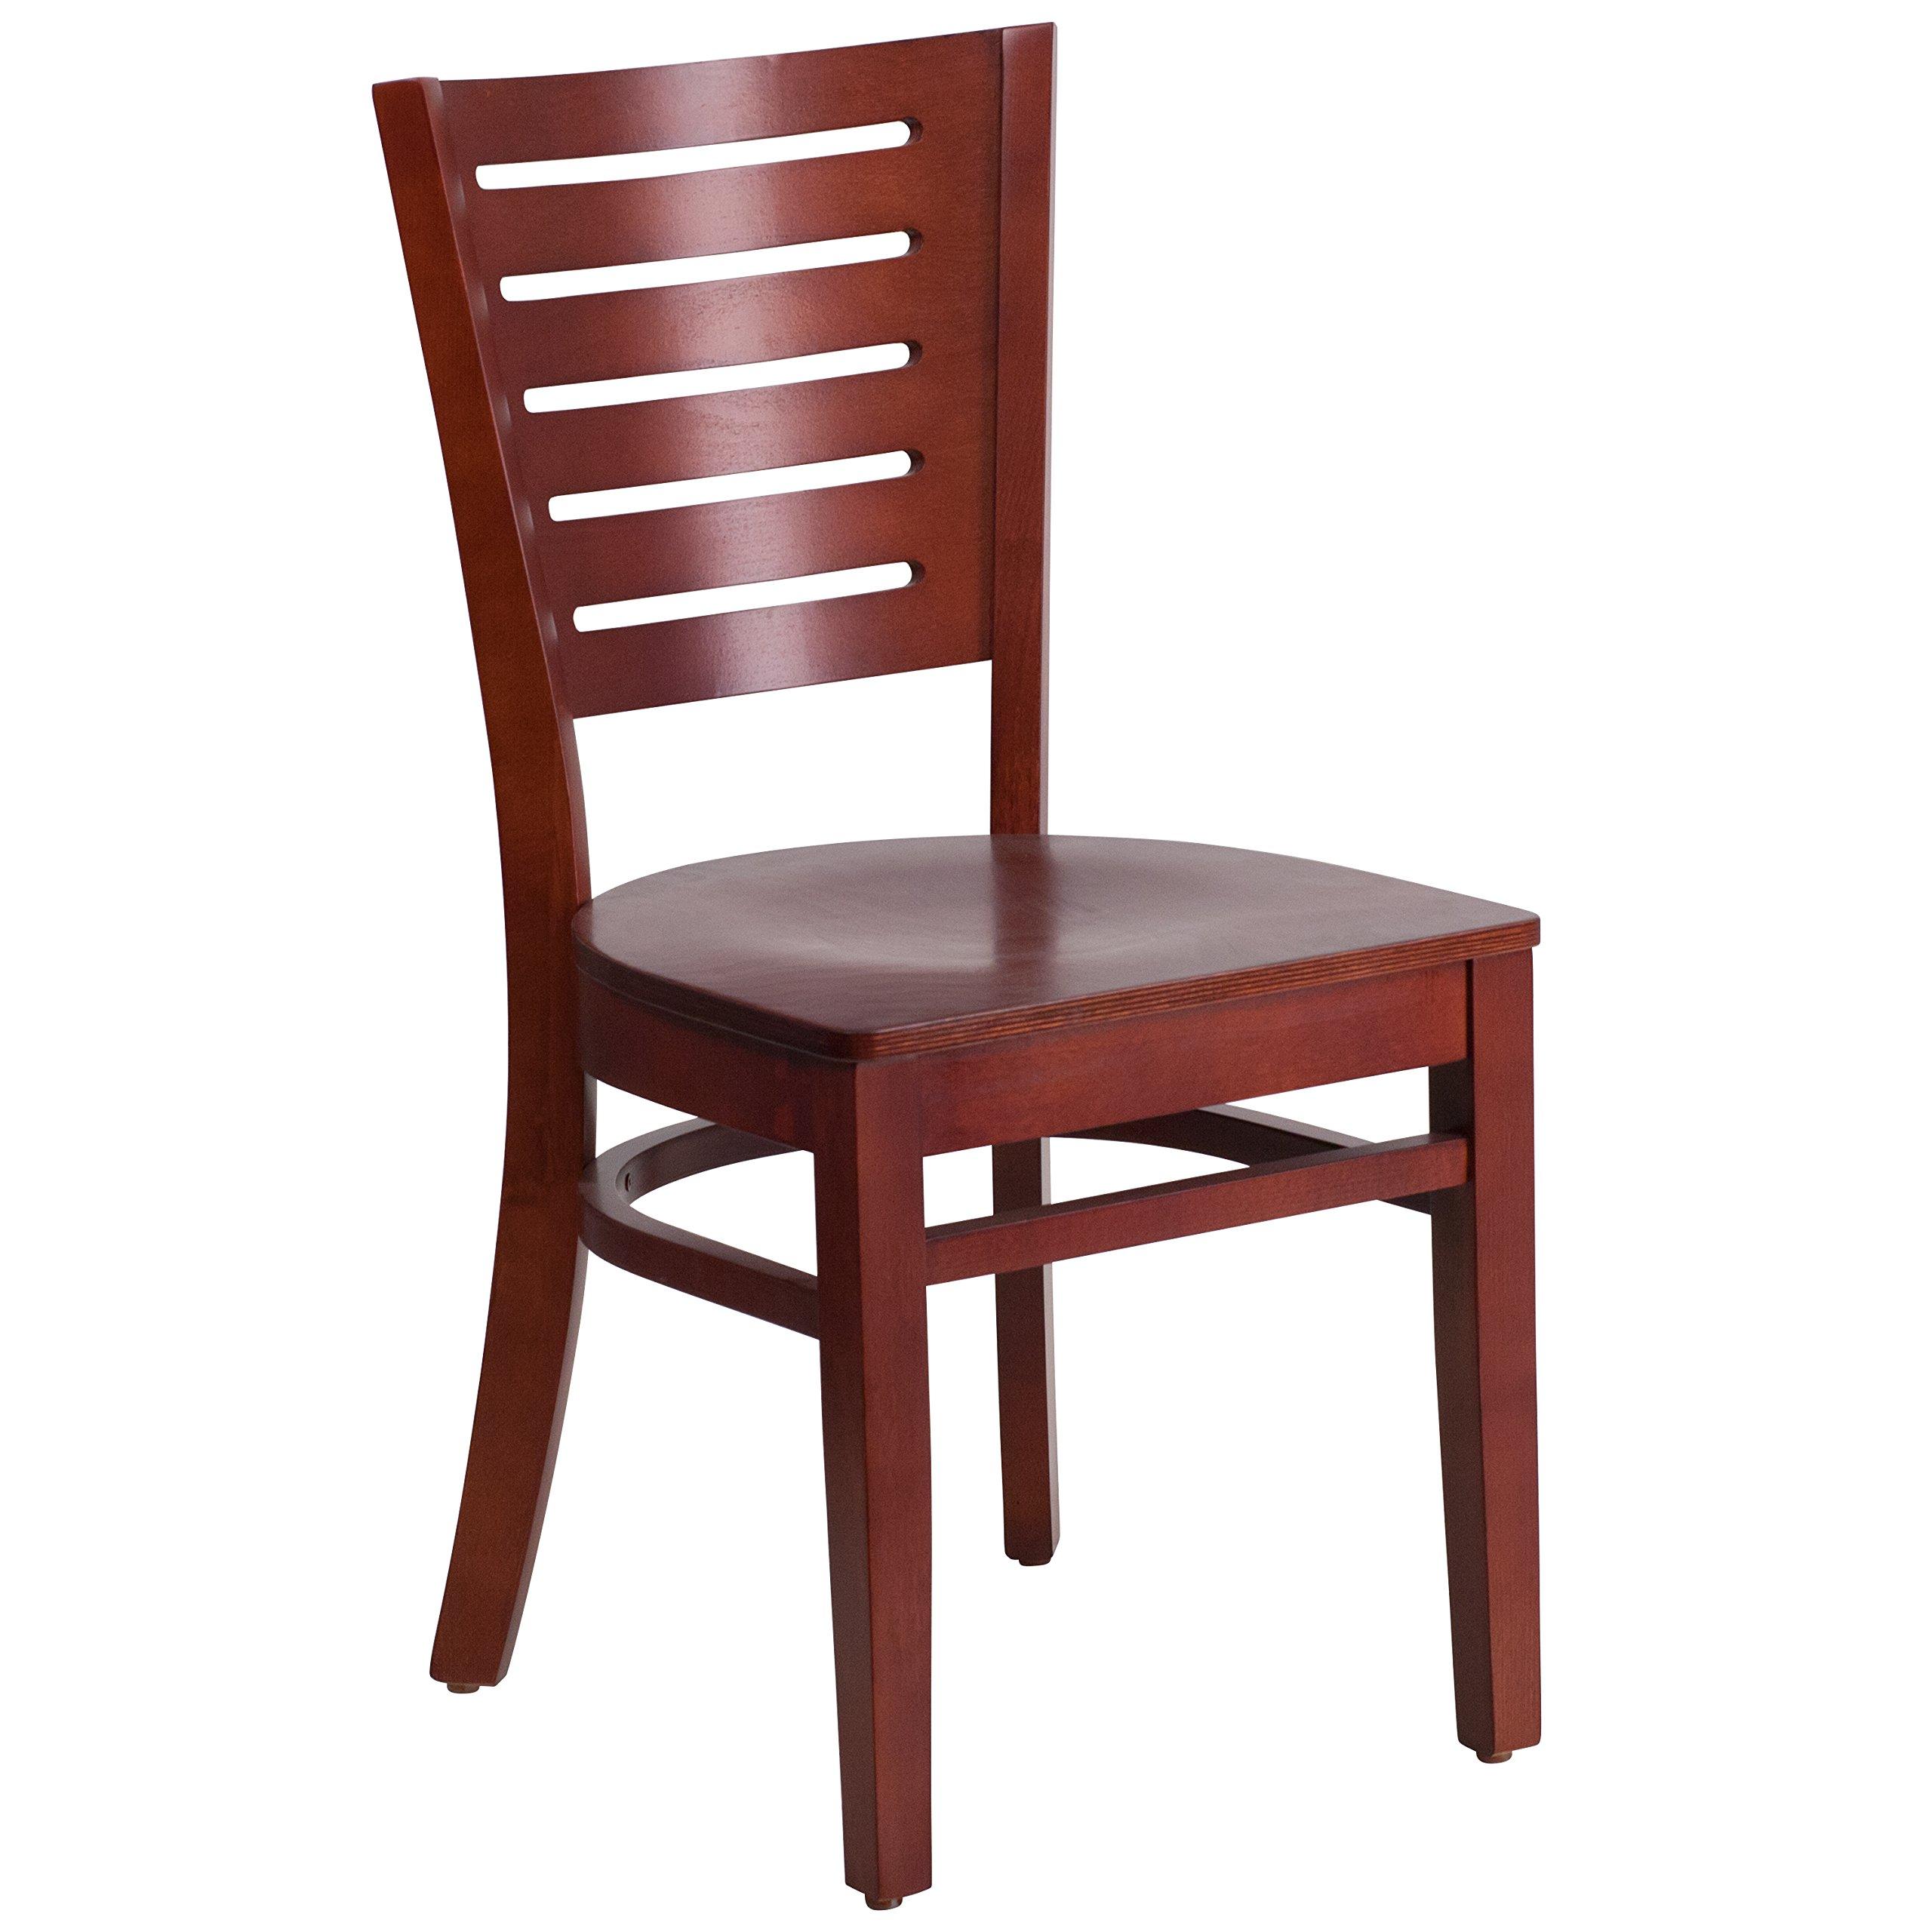 Flash Furniture Darby Series Slat Back Mahogany Wood Restaurant Chair